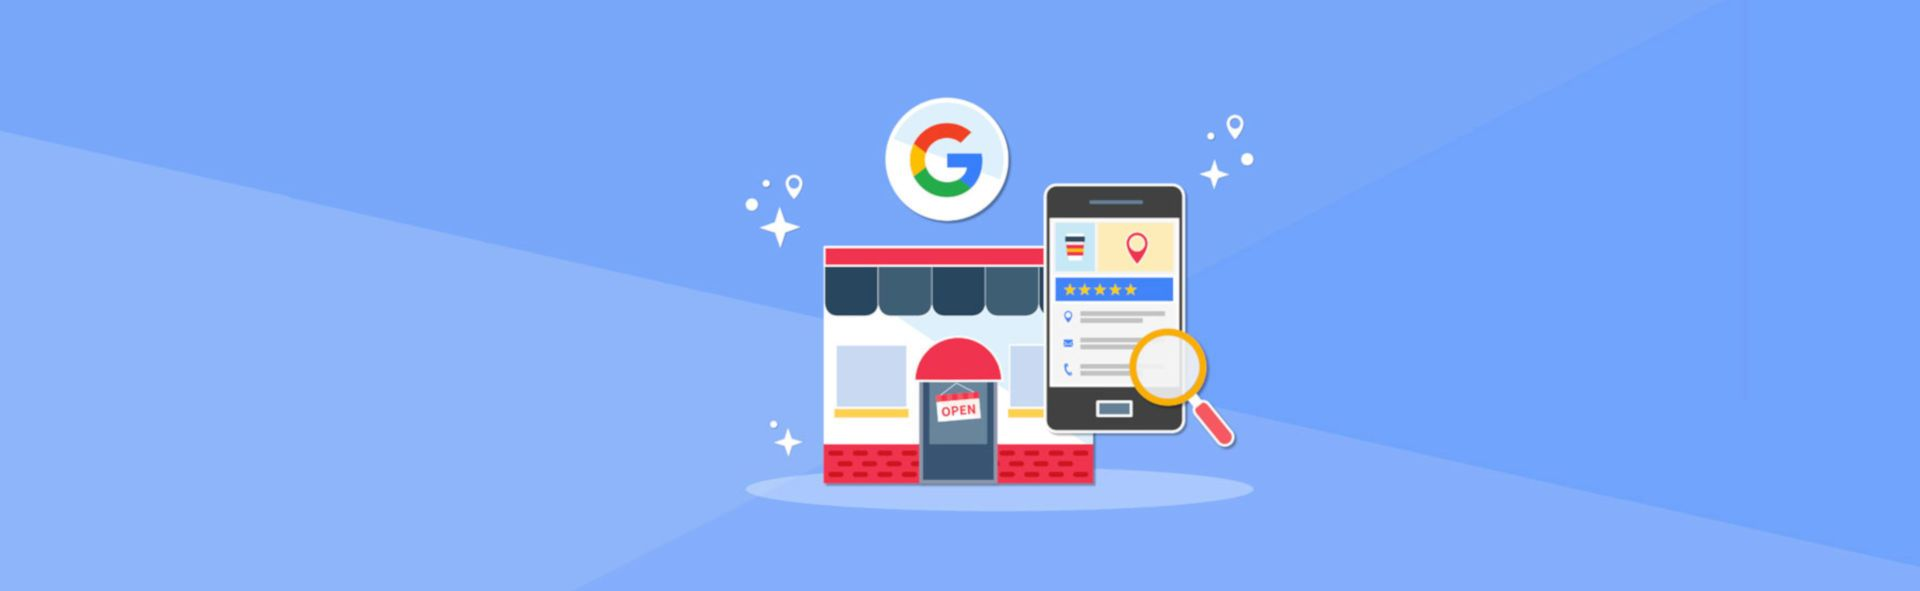 Google My Business Pescara L'Aquila Chieti Teramo